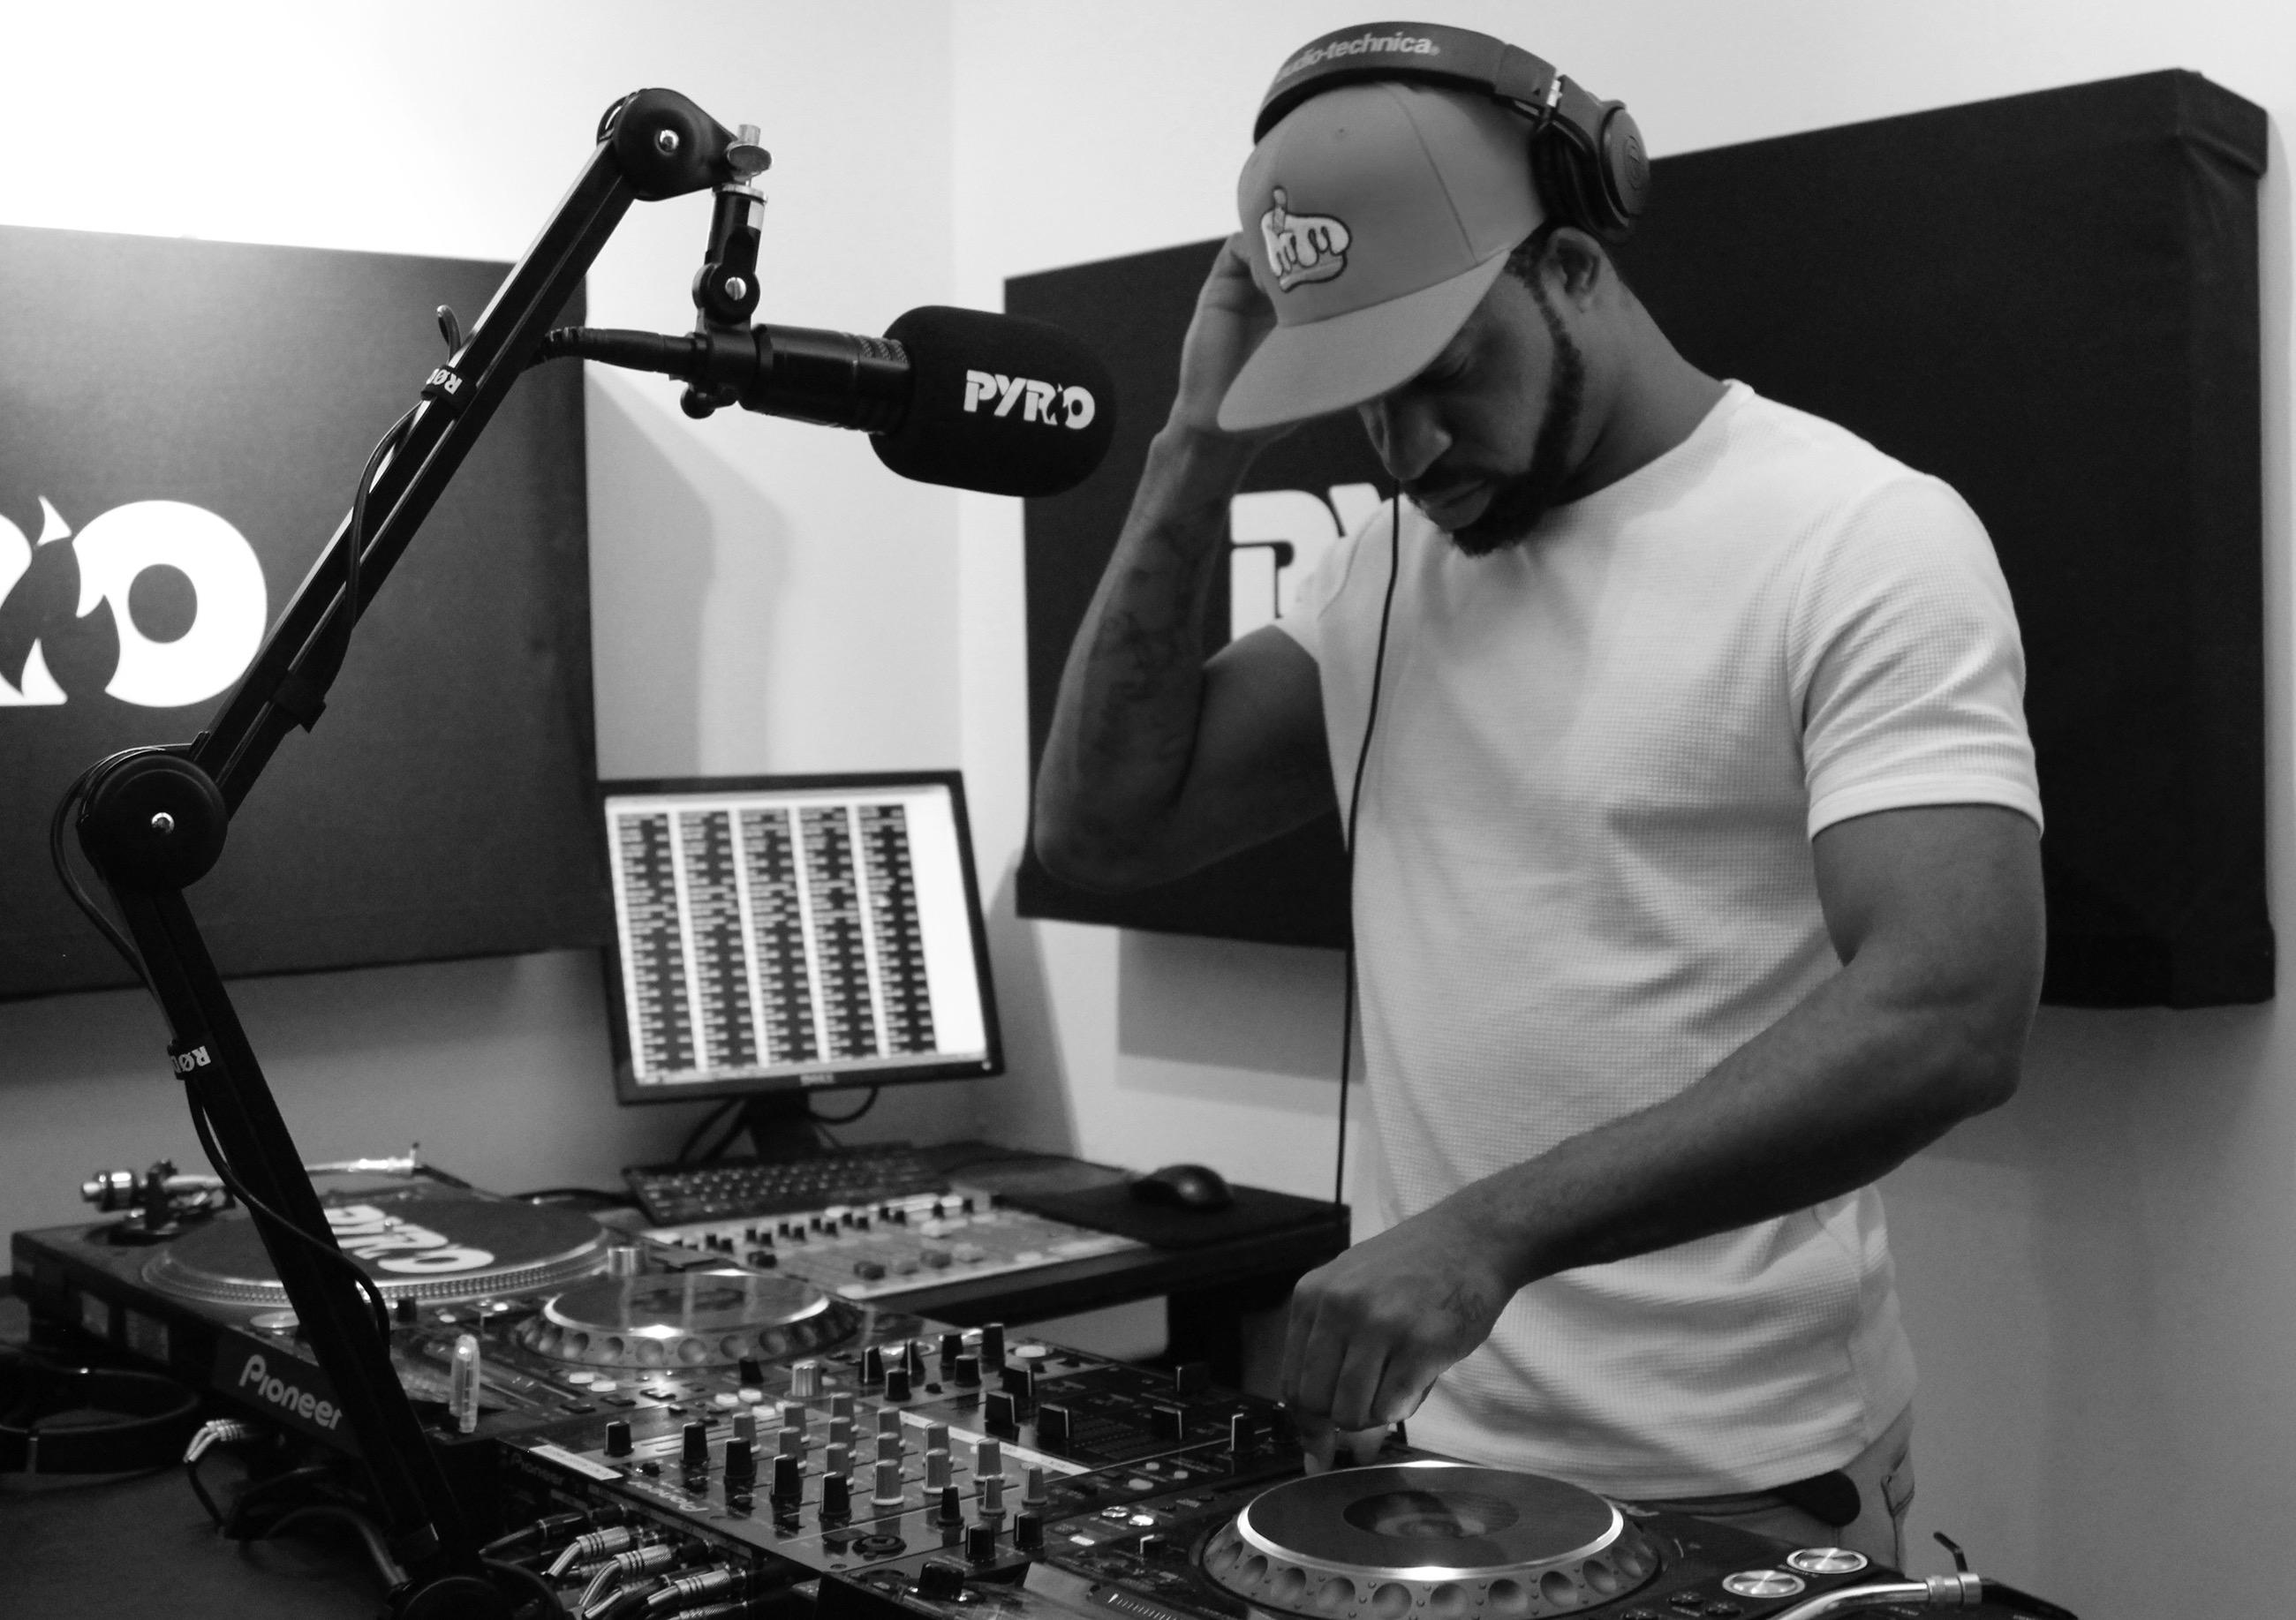 DJ Mak10, DJ Mak 10, DJ MakTen, DJ Mak Ten, Grime, PyroRadio, PyroRadio.com